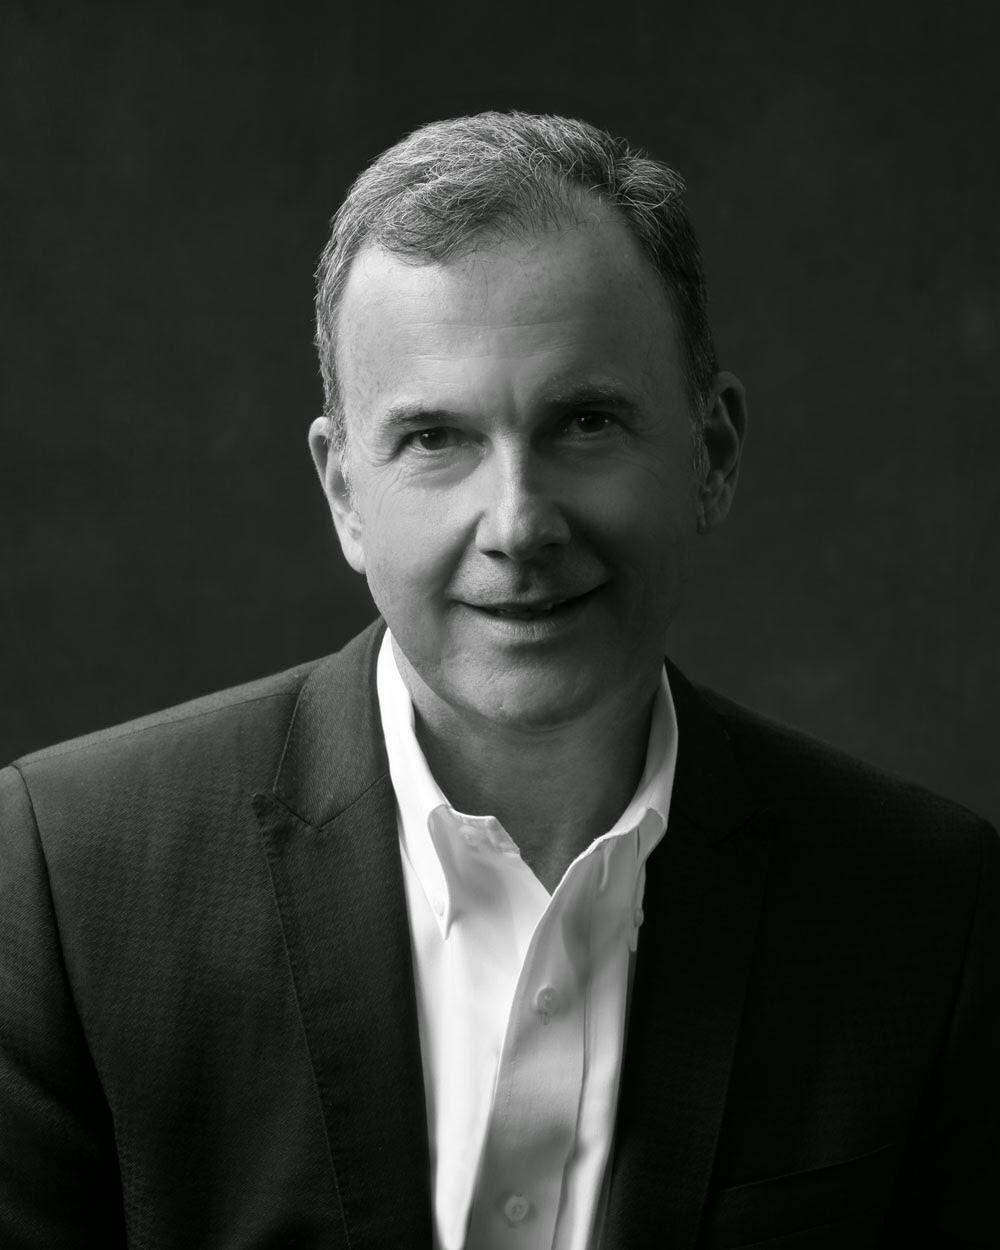 Rick Gannotta